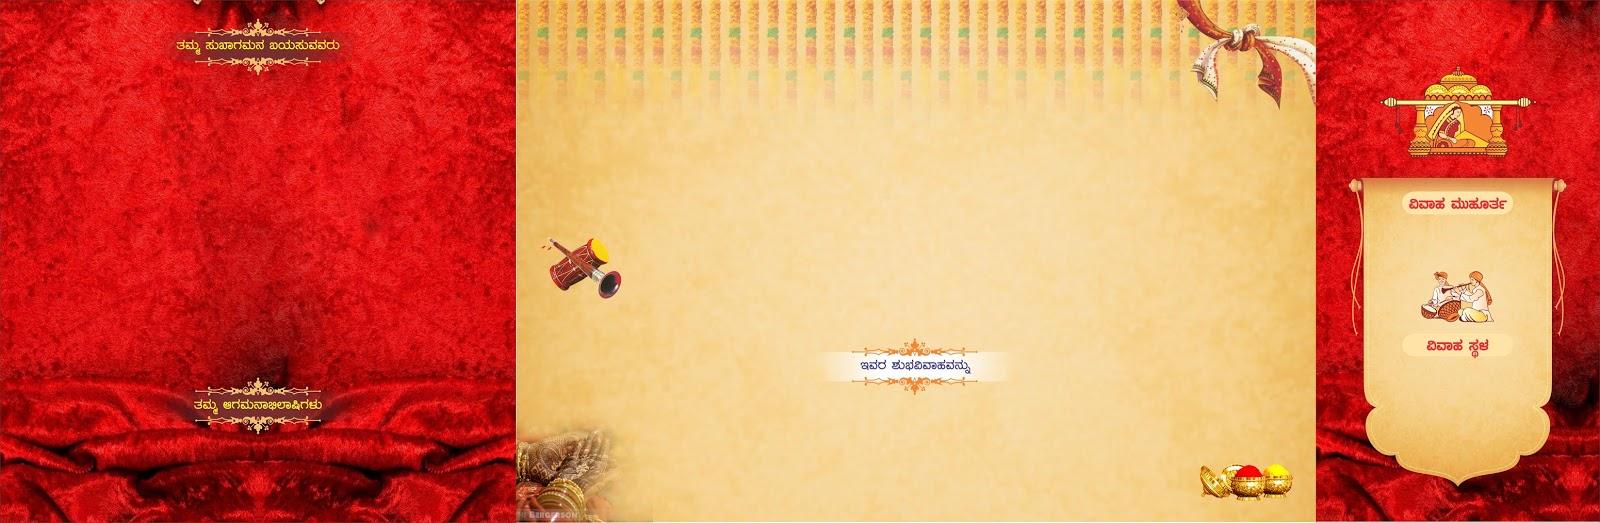 Indian Wedding Invitation Designs Indian Wedding Invitation Design